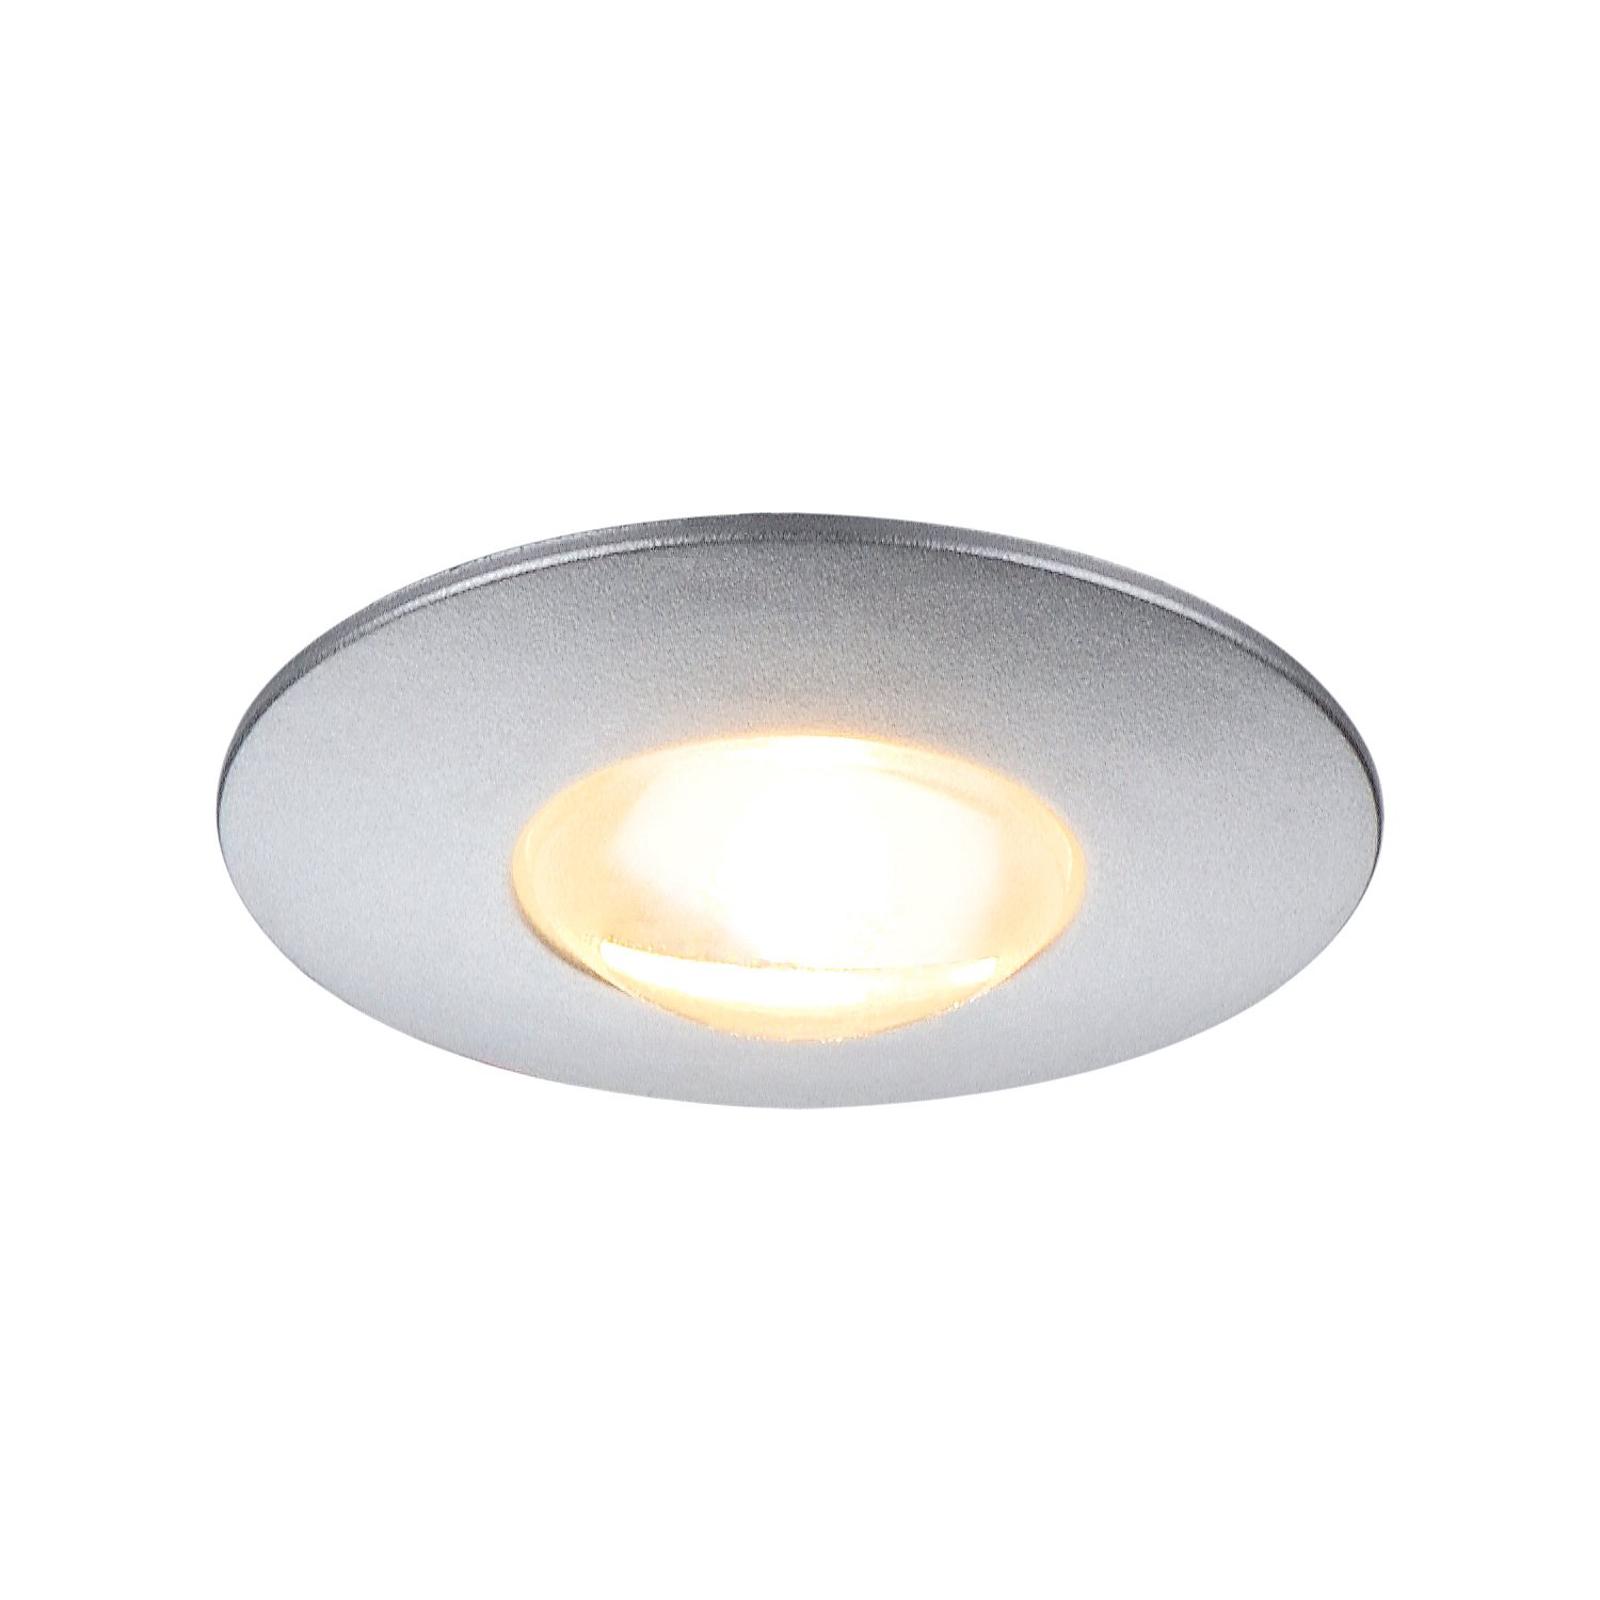 Spot encastré LED DEKLED, LED blanc chaud